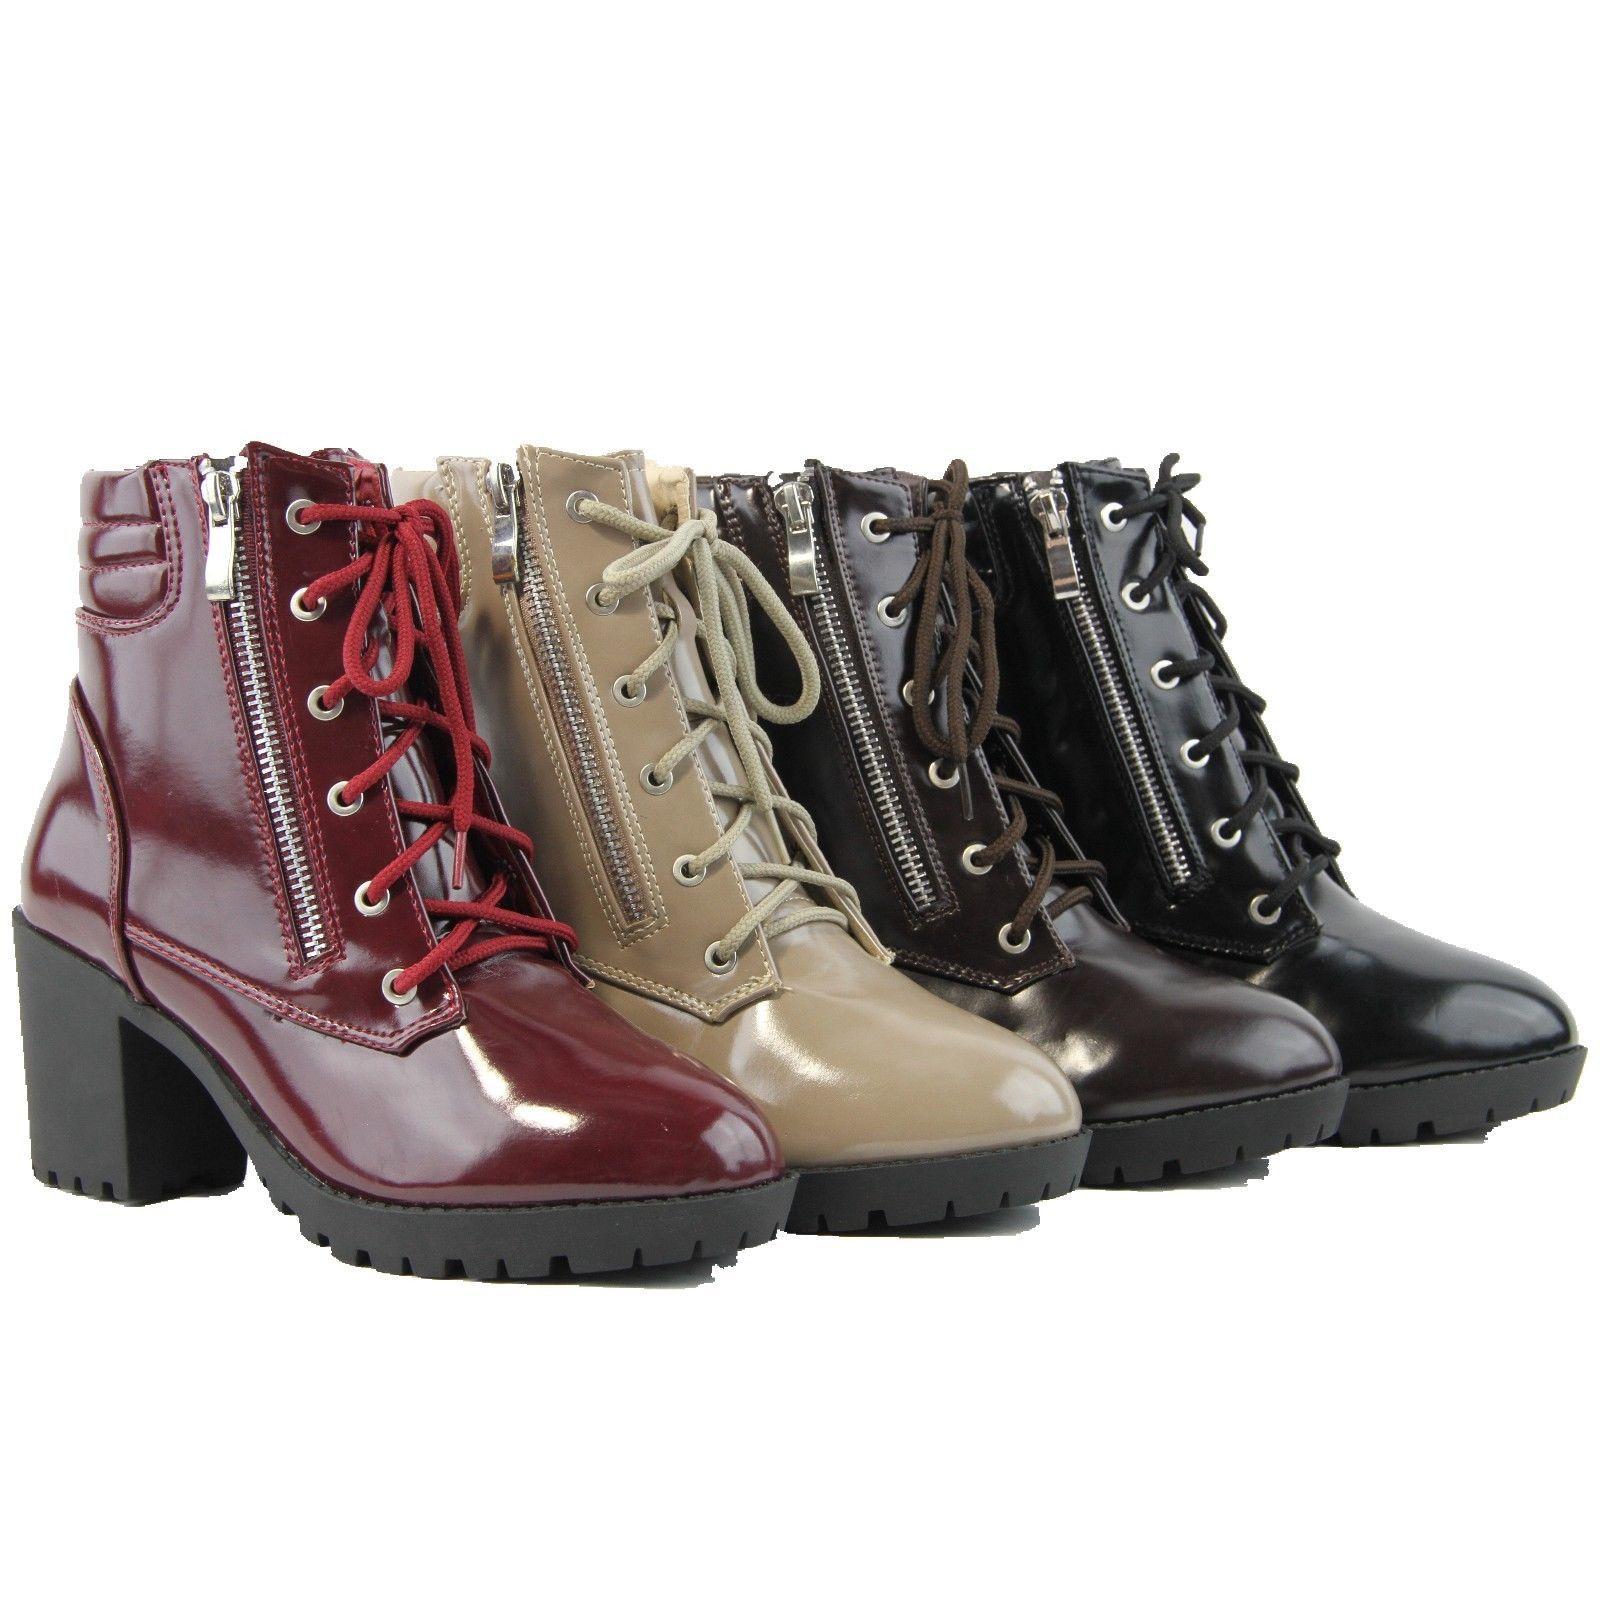 Women Boots High Cuban Heels Fashion Two Zipper Design Patent